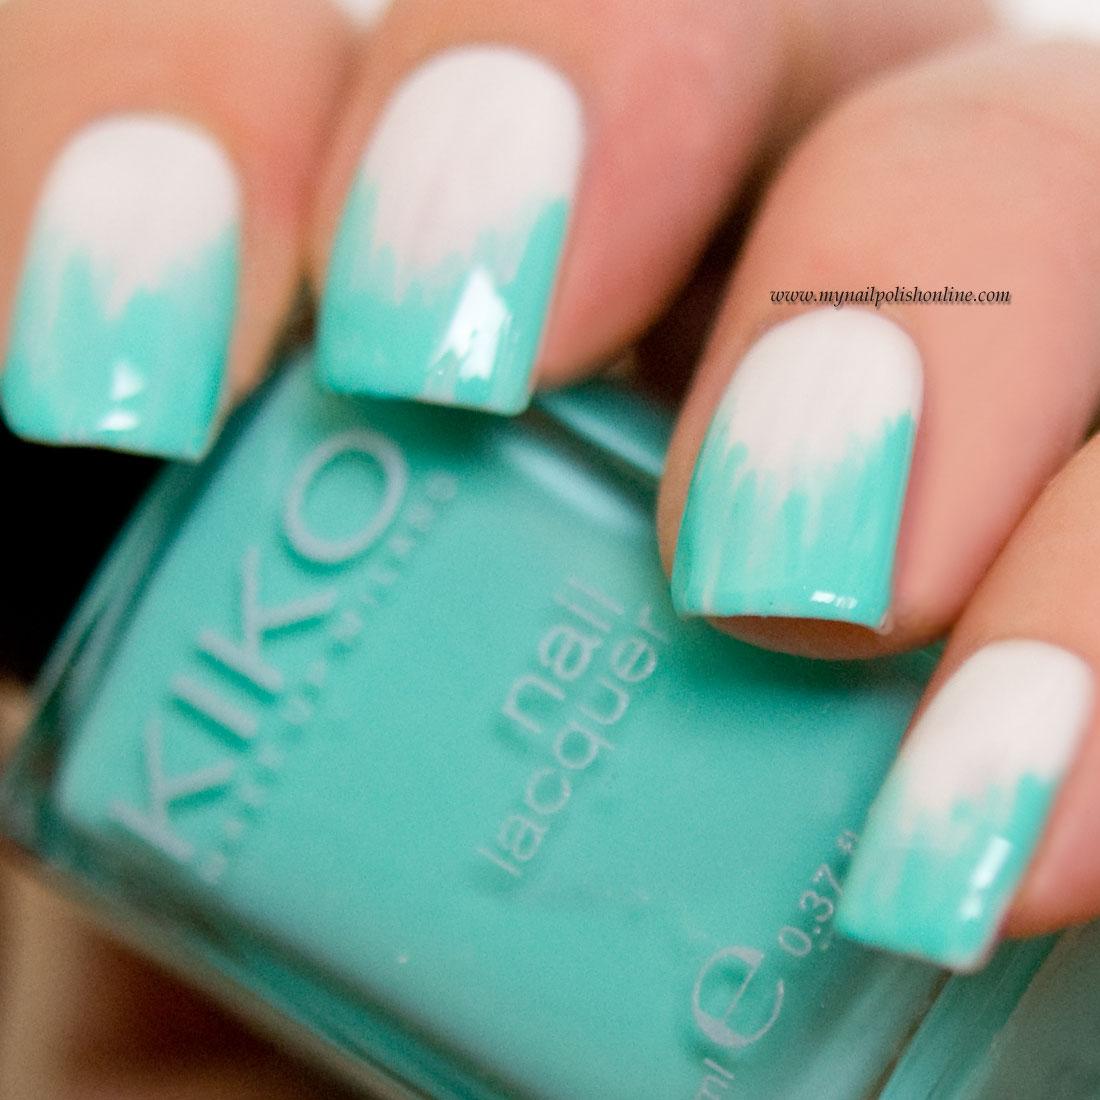 Nail Art - Turquoise Chevron IKATs - My Nail Polish Online